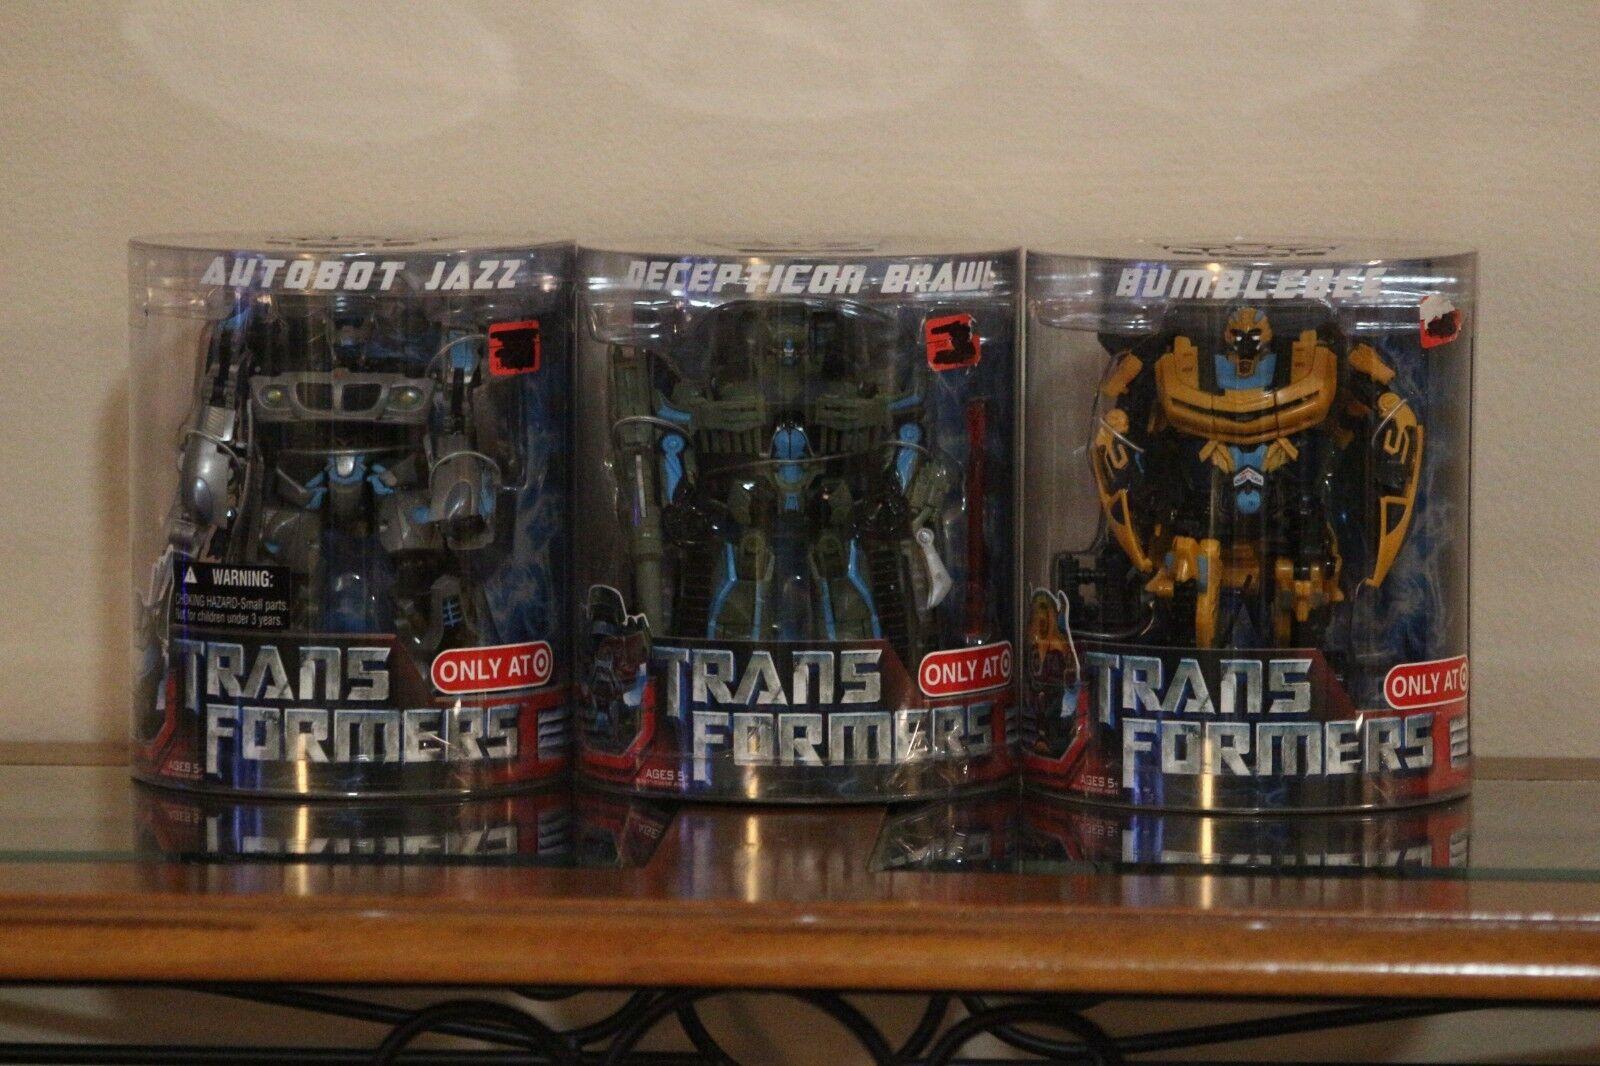 Transformers Decepticon Brawl bumblebbe Autobot Jazz